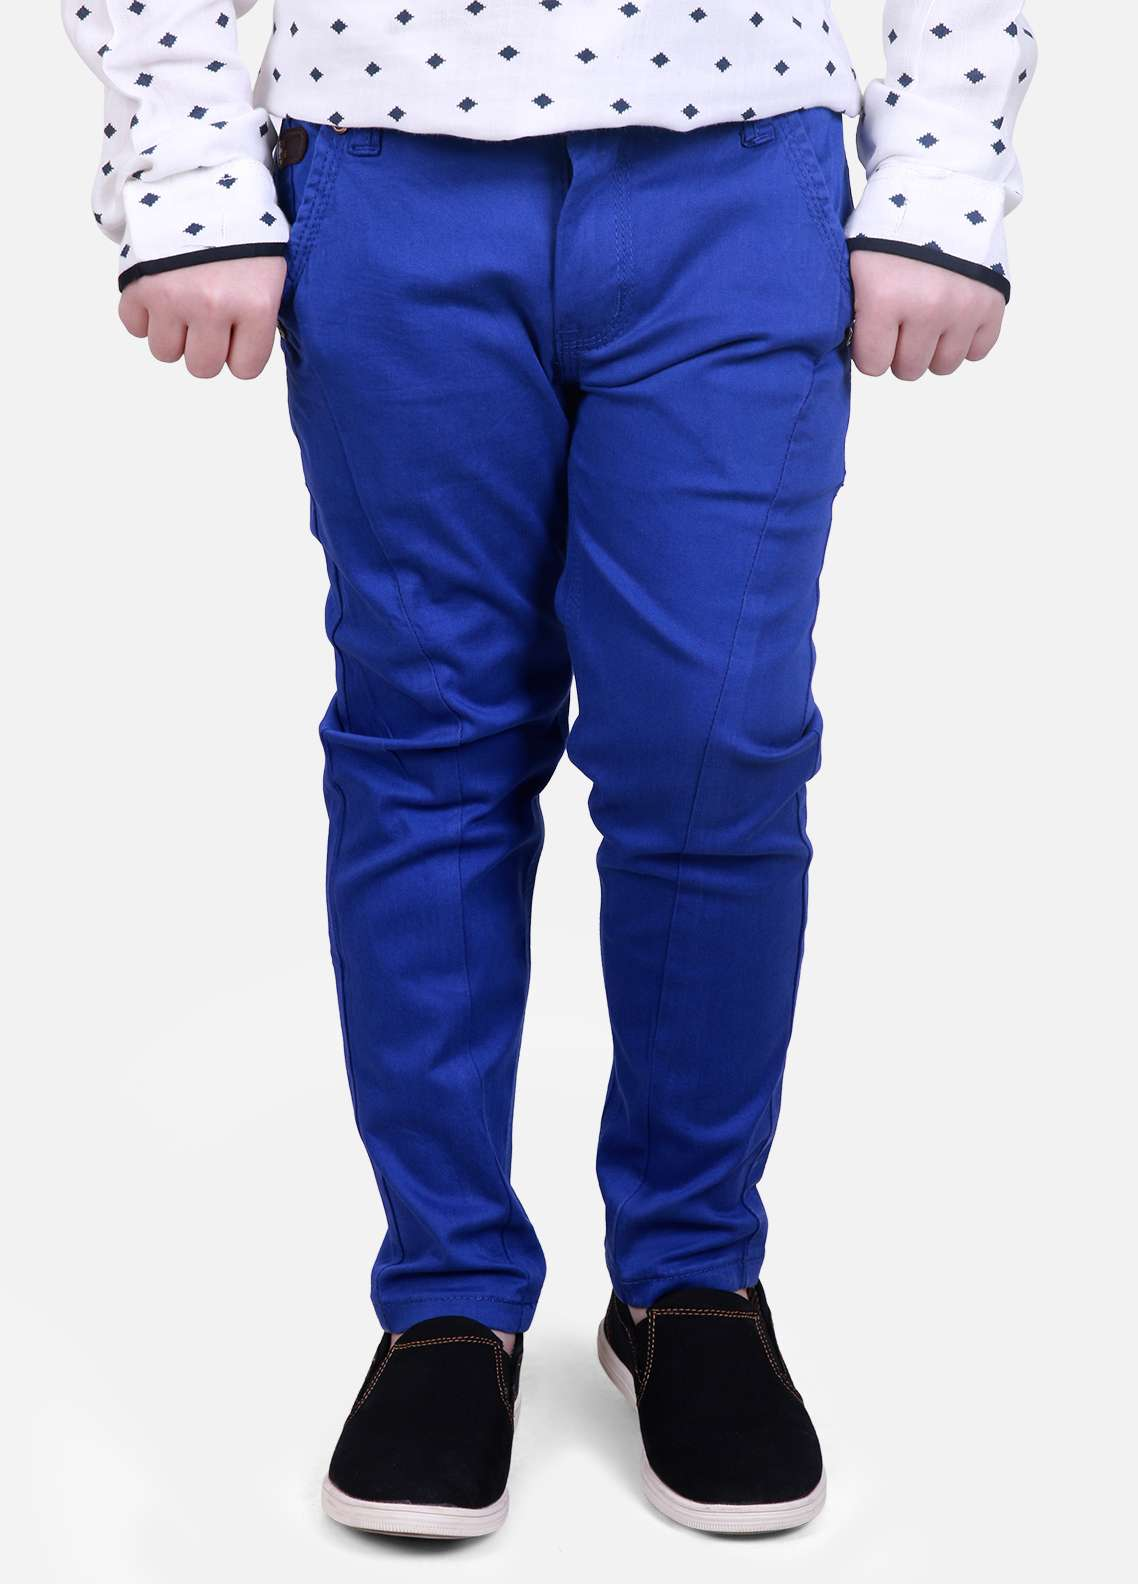 Edenrobe Cotton Plain Texture Boys Pants - Royal Blue EDK18P 24053